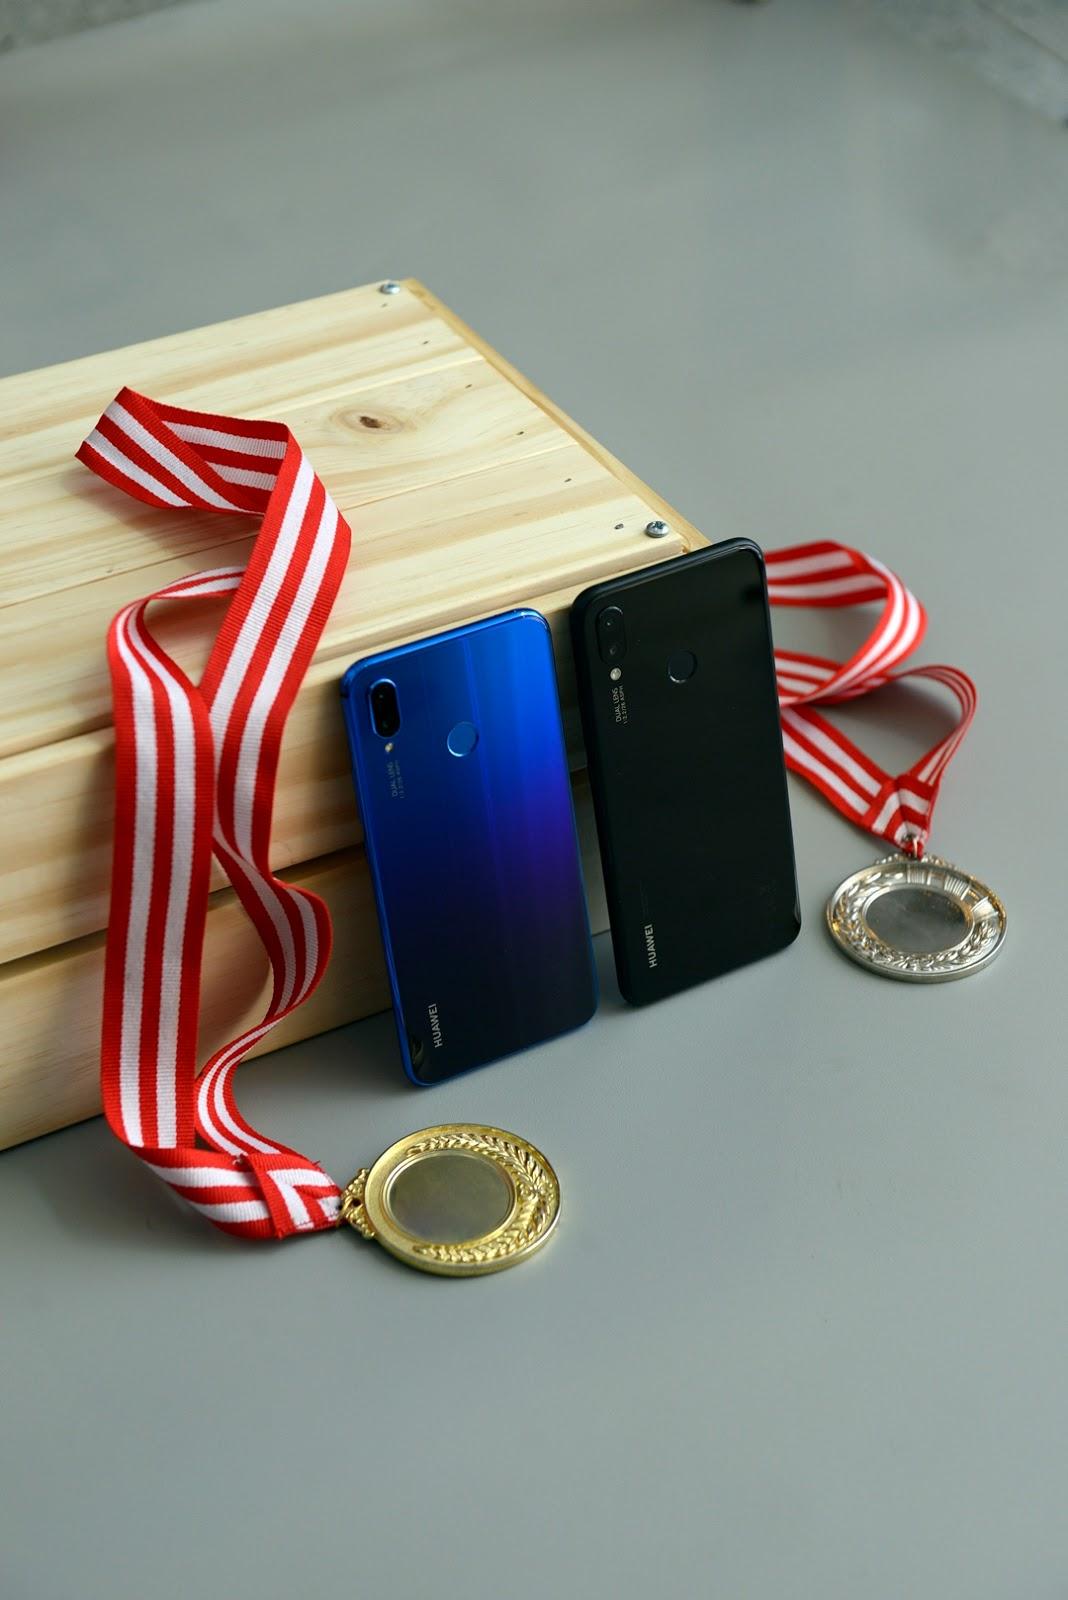 Handphone idaman 2018